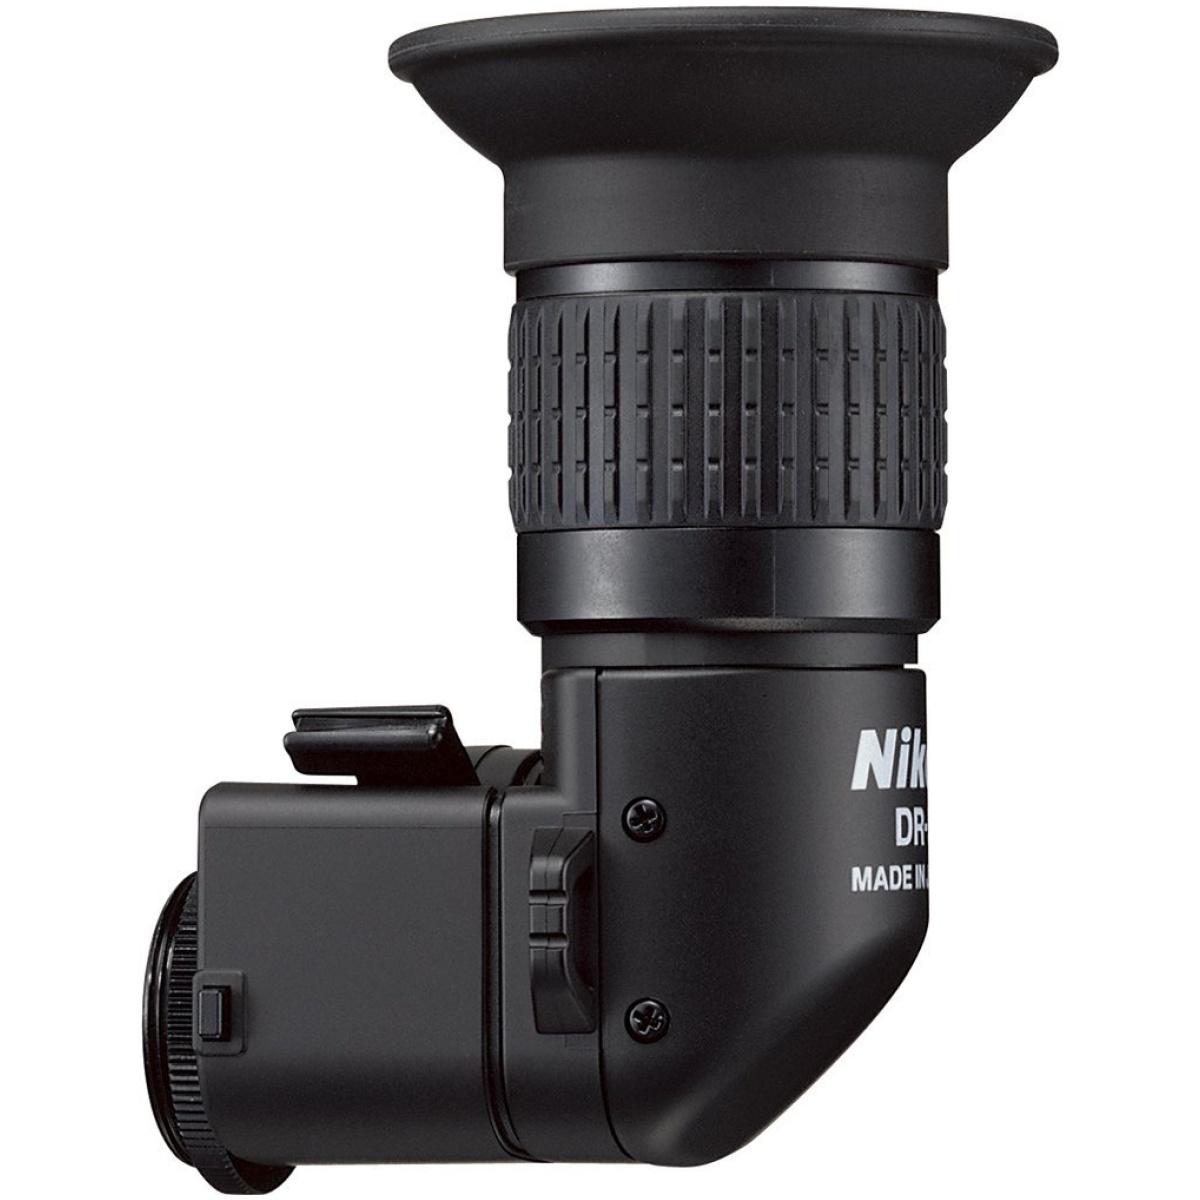 Nikon DR-5 Winkelsucher